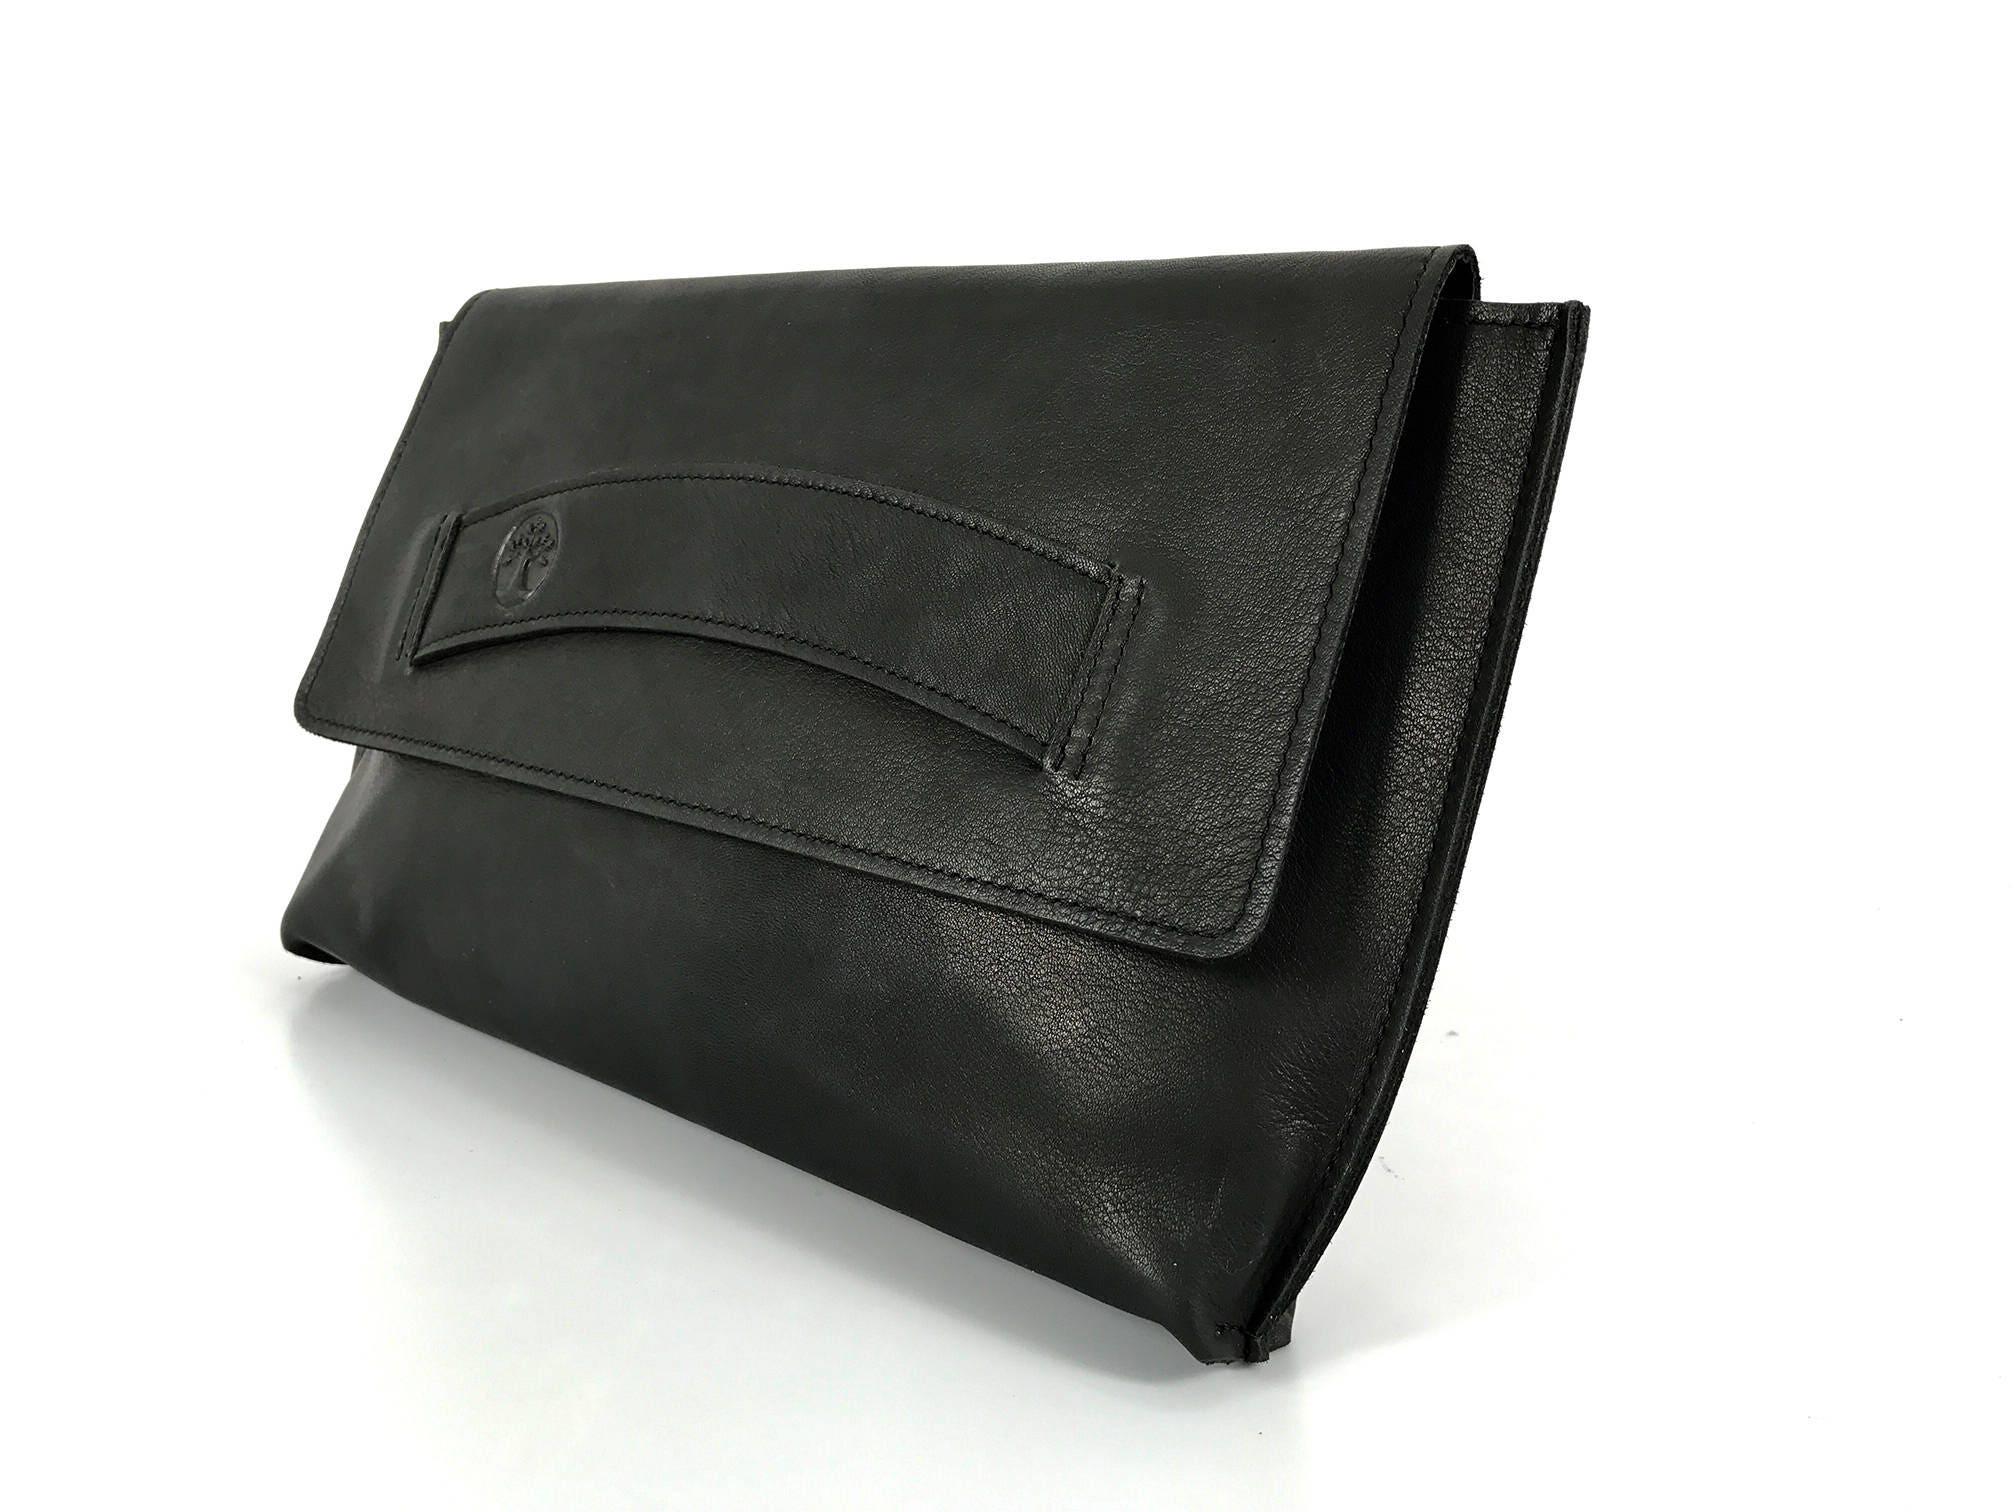 e0056d55c4 Leather Clutch with Strap Minimalist Clutch Bag Black Clutch | Etsy